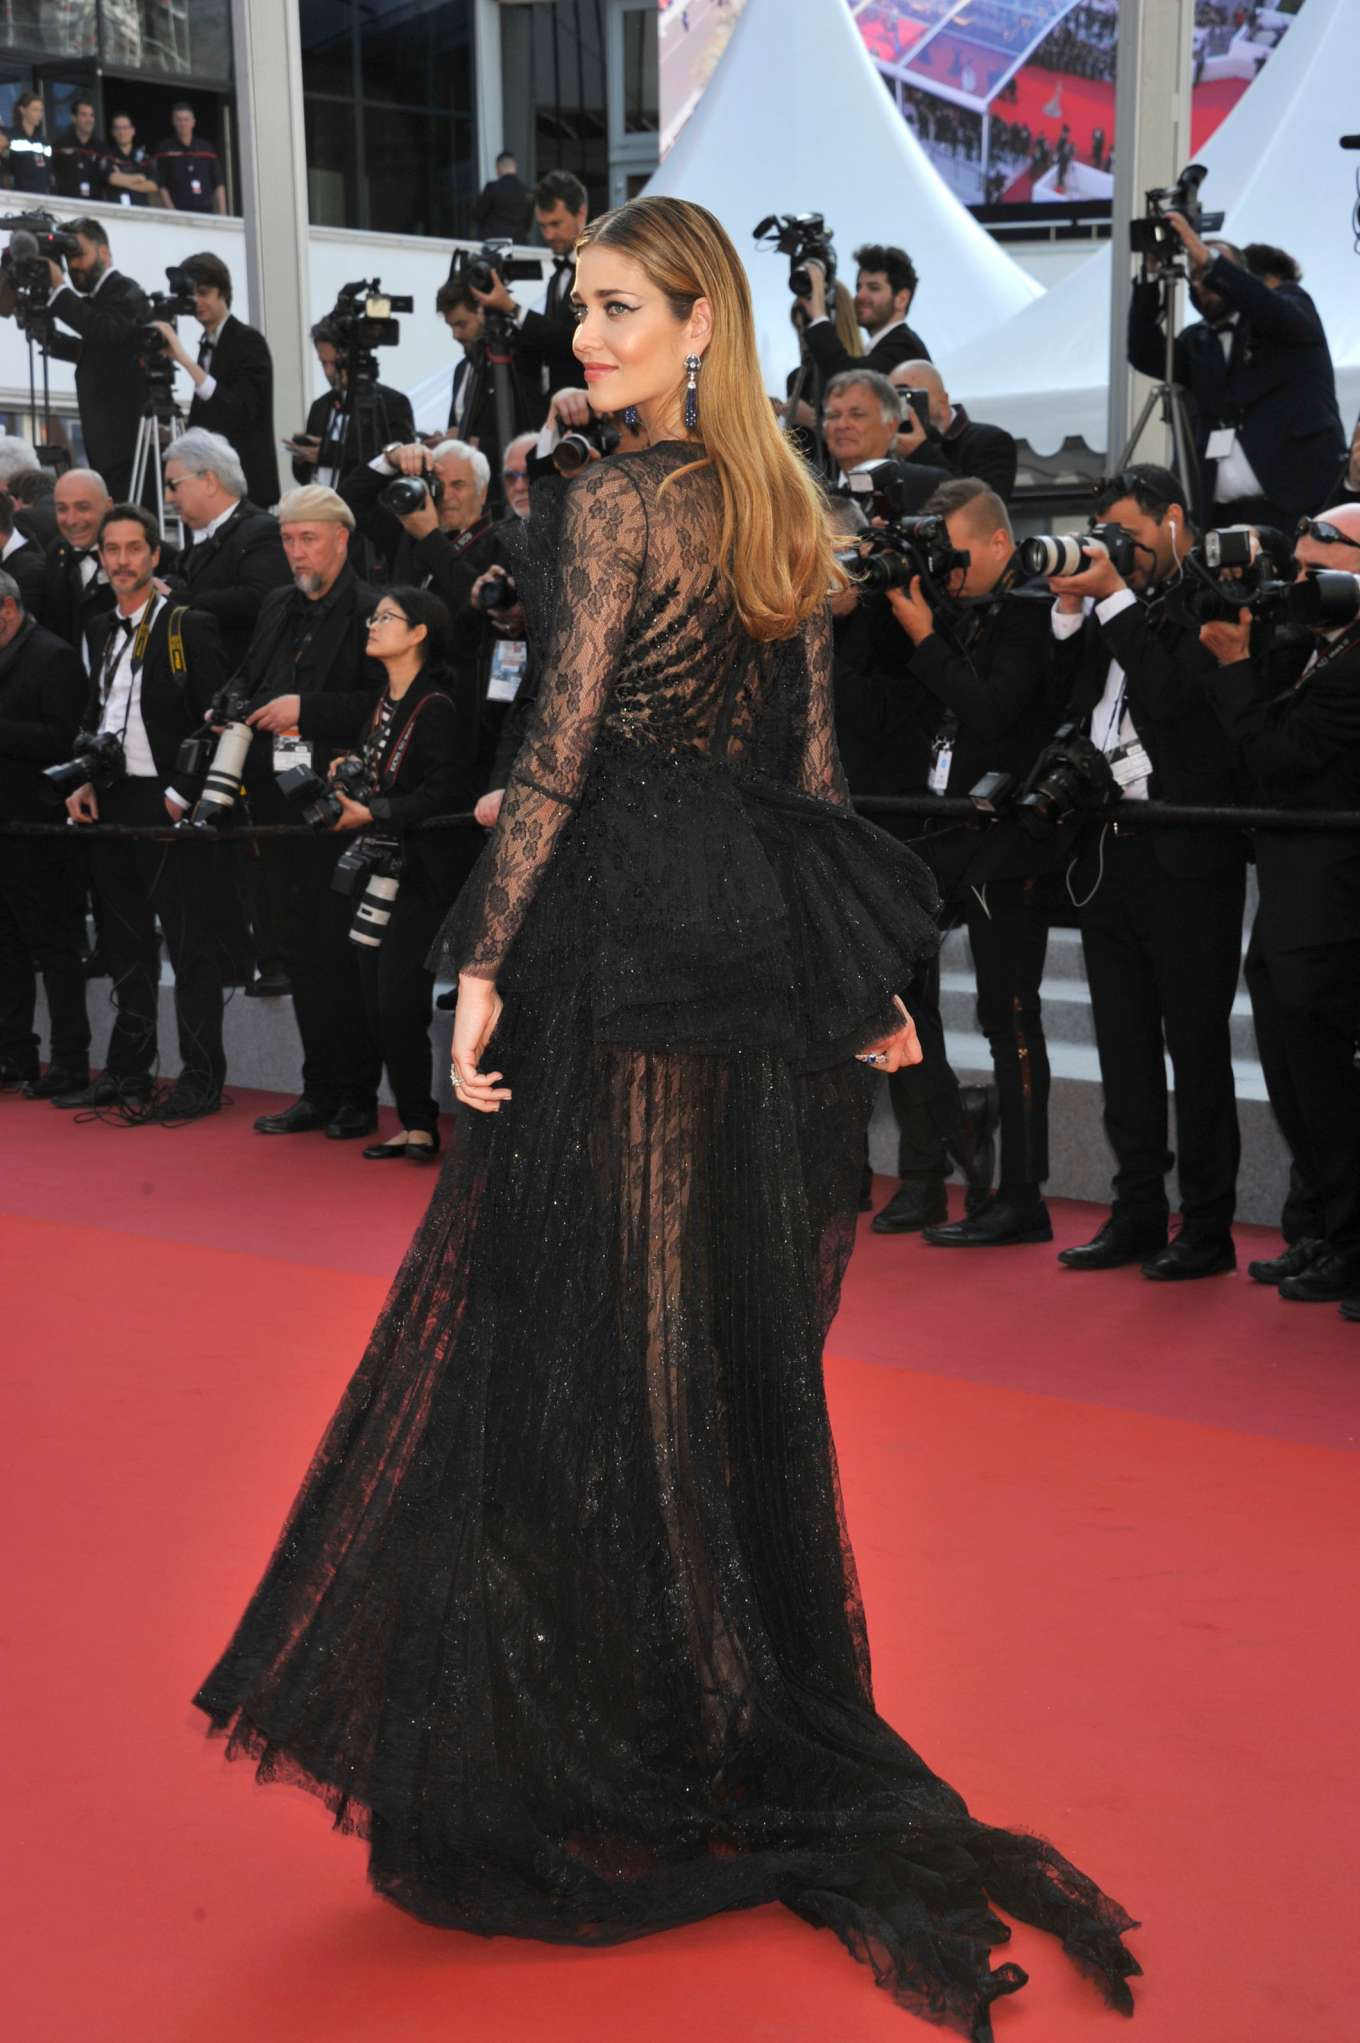 Ana Beatriz Barros 2019 : Ana Beatriz Barros: The Traitor Premiere at 2019 Cannes Film Festival-03